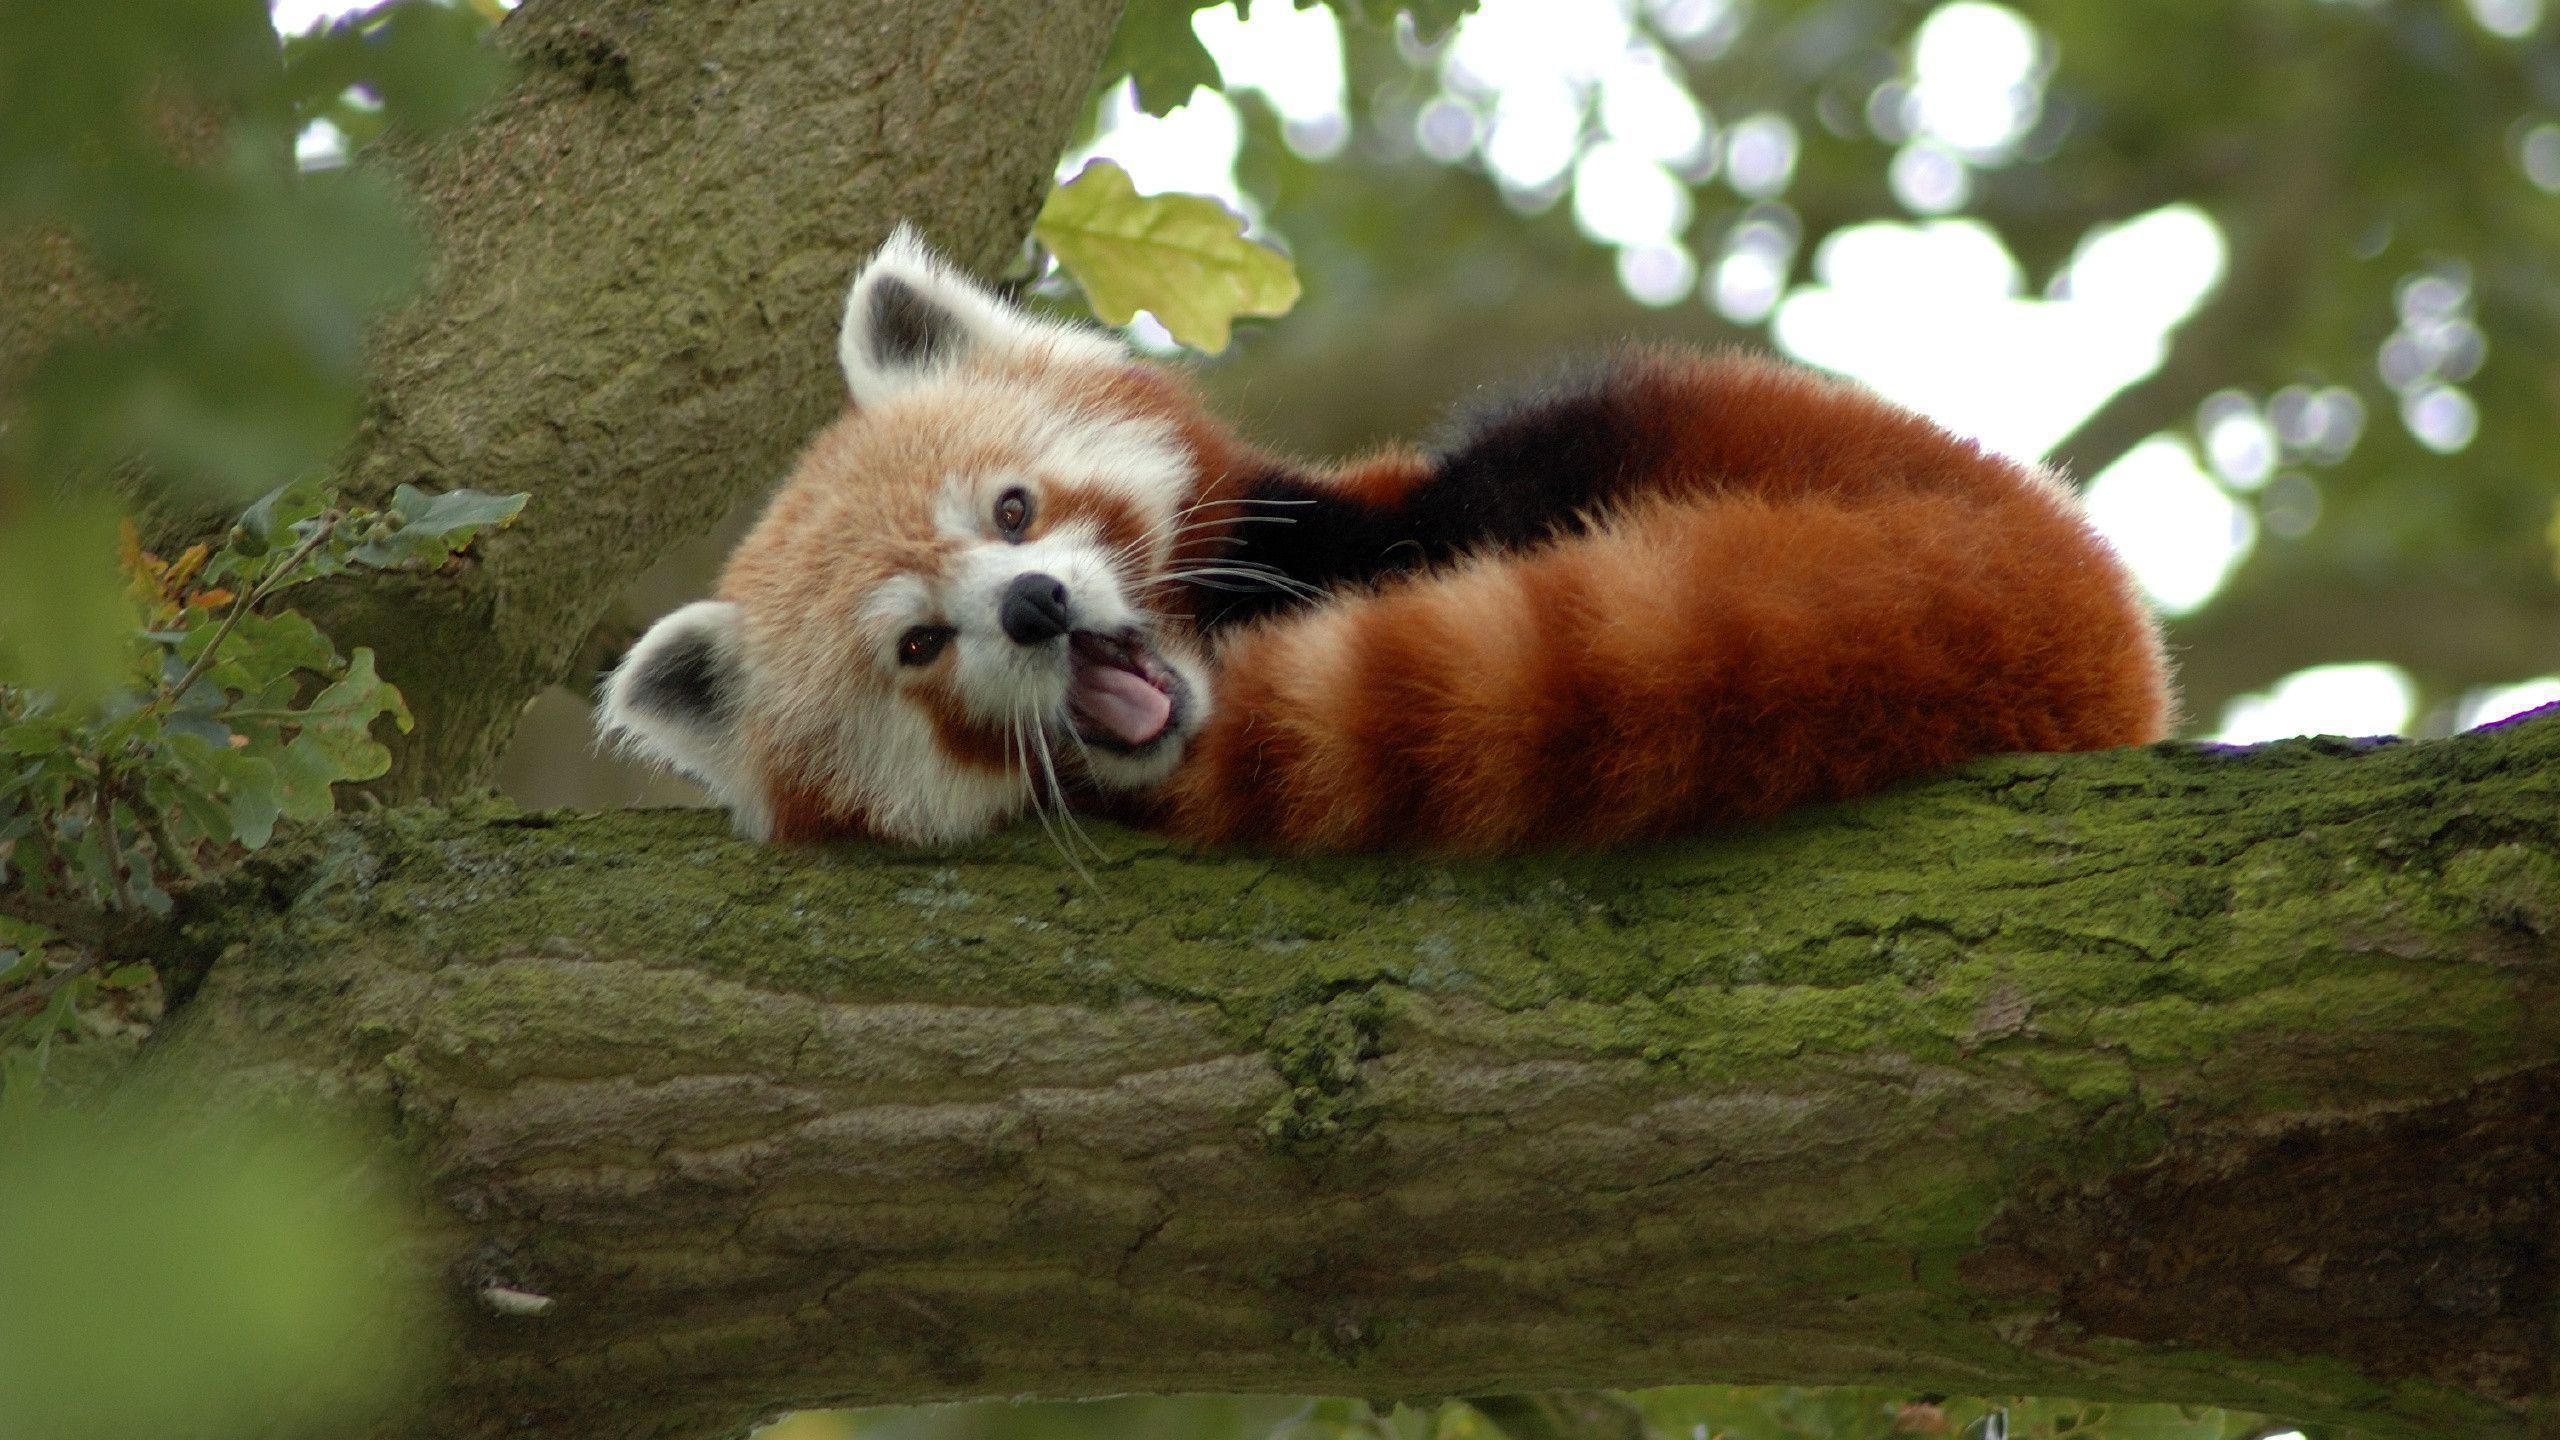 Red Panda Wallpapers Top Free Red Panda Backgrounds Wallpaperaccess